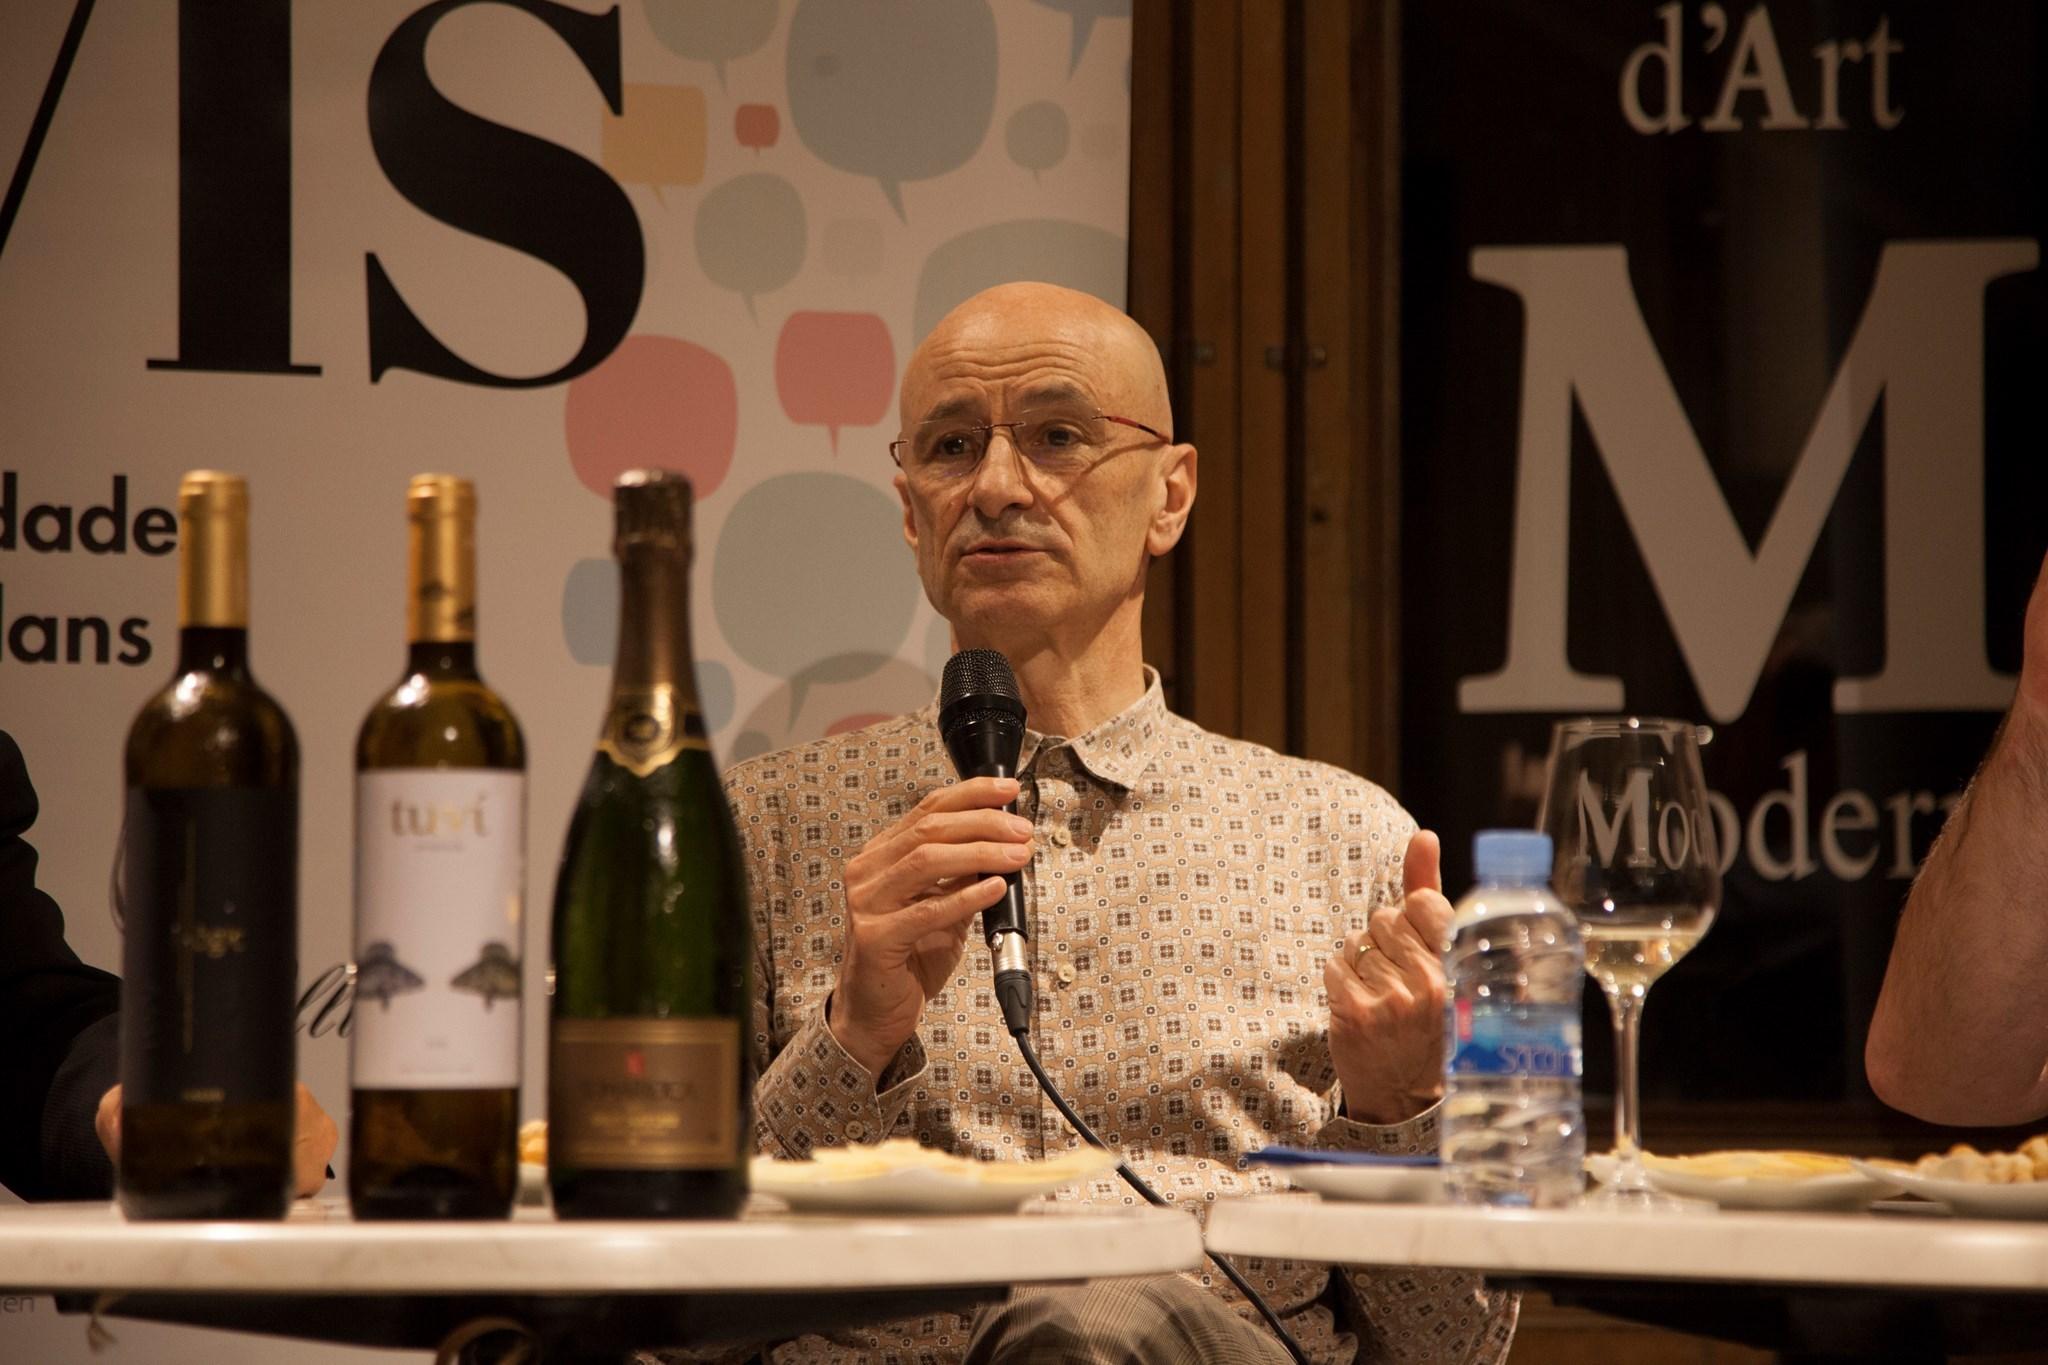 #VisàVis: Cesc Gelabert i el celler Sumarroca